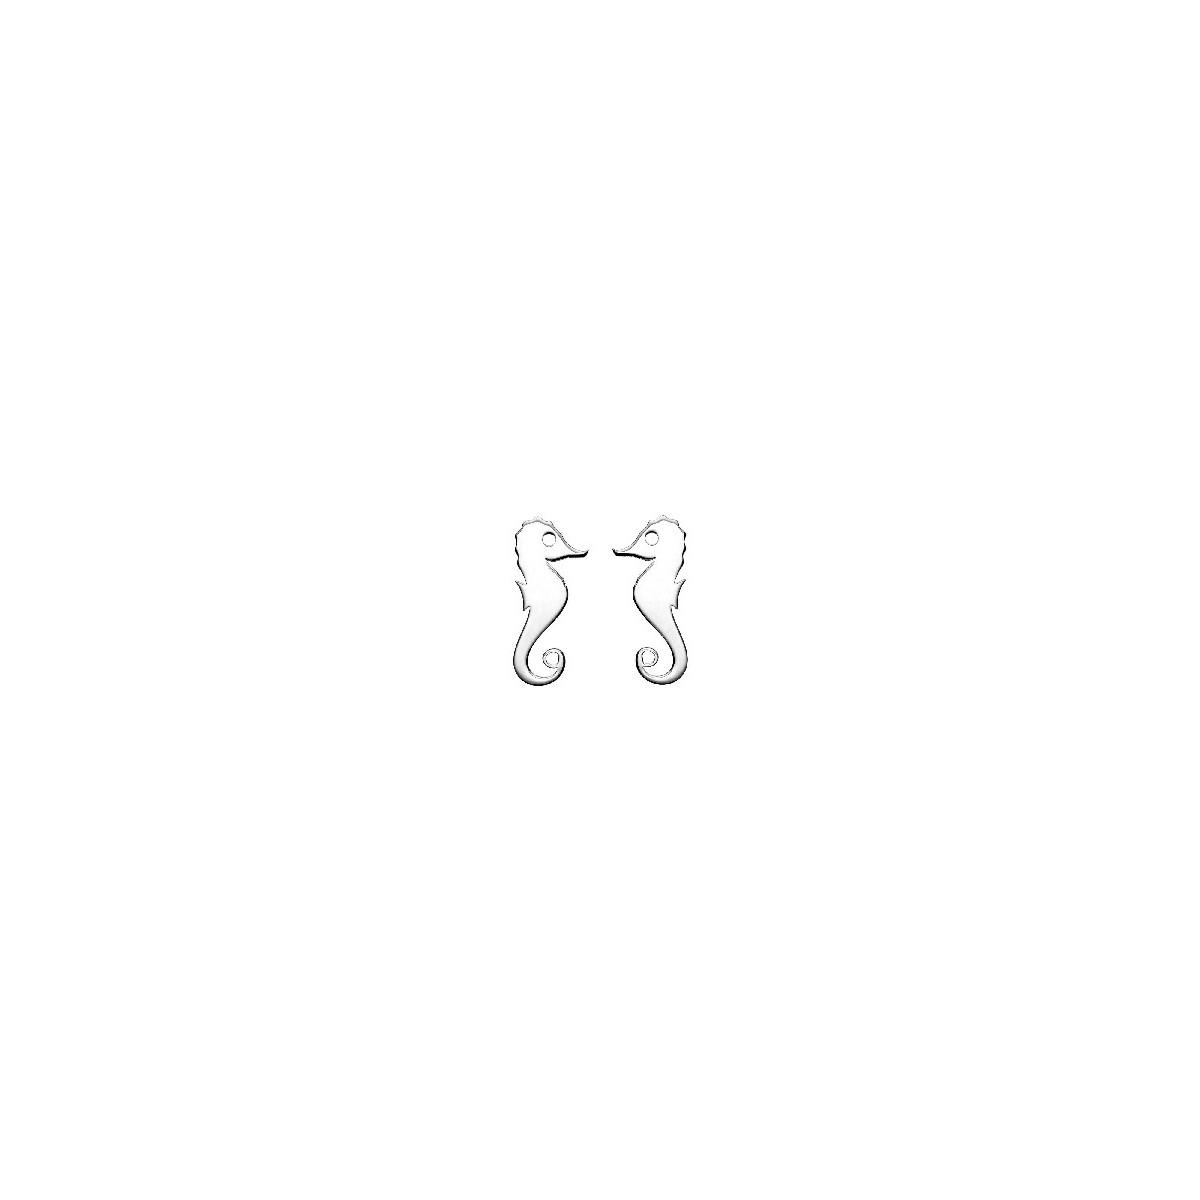 PENDIENTES PLATA - T0411151